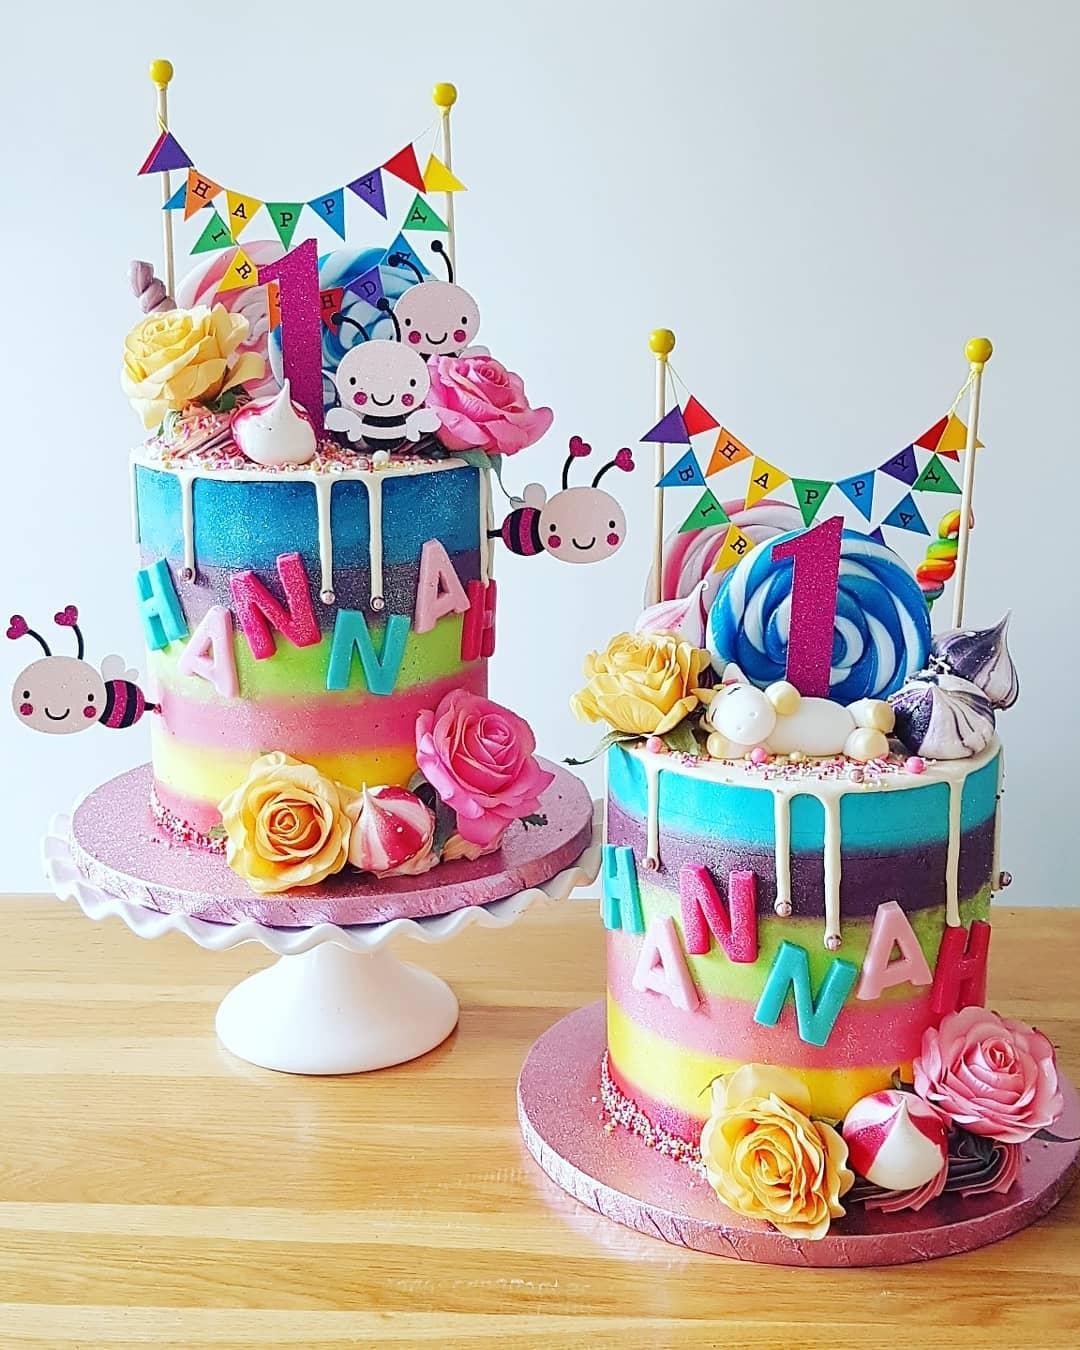 Matching Rainbow cakes